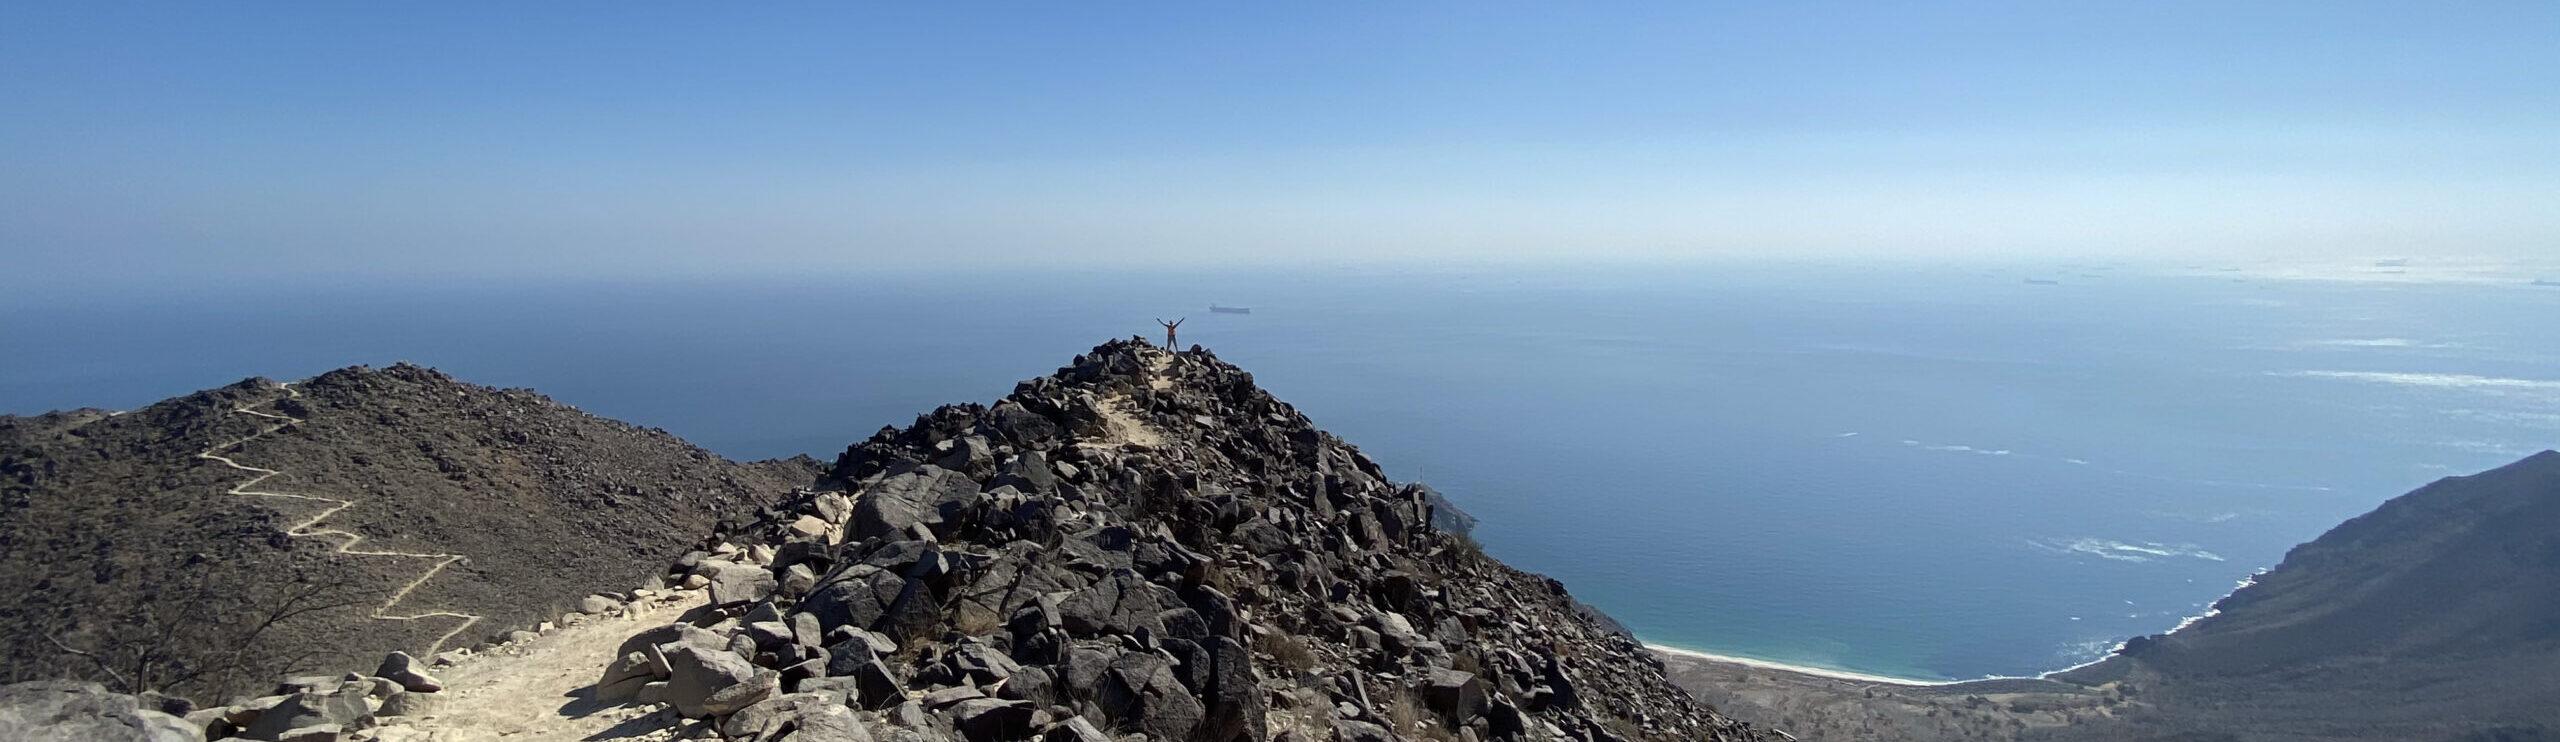 Rabi Tower – The infamous hike of Khorfakkan